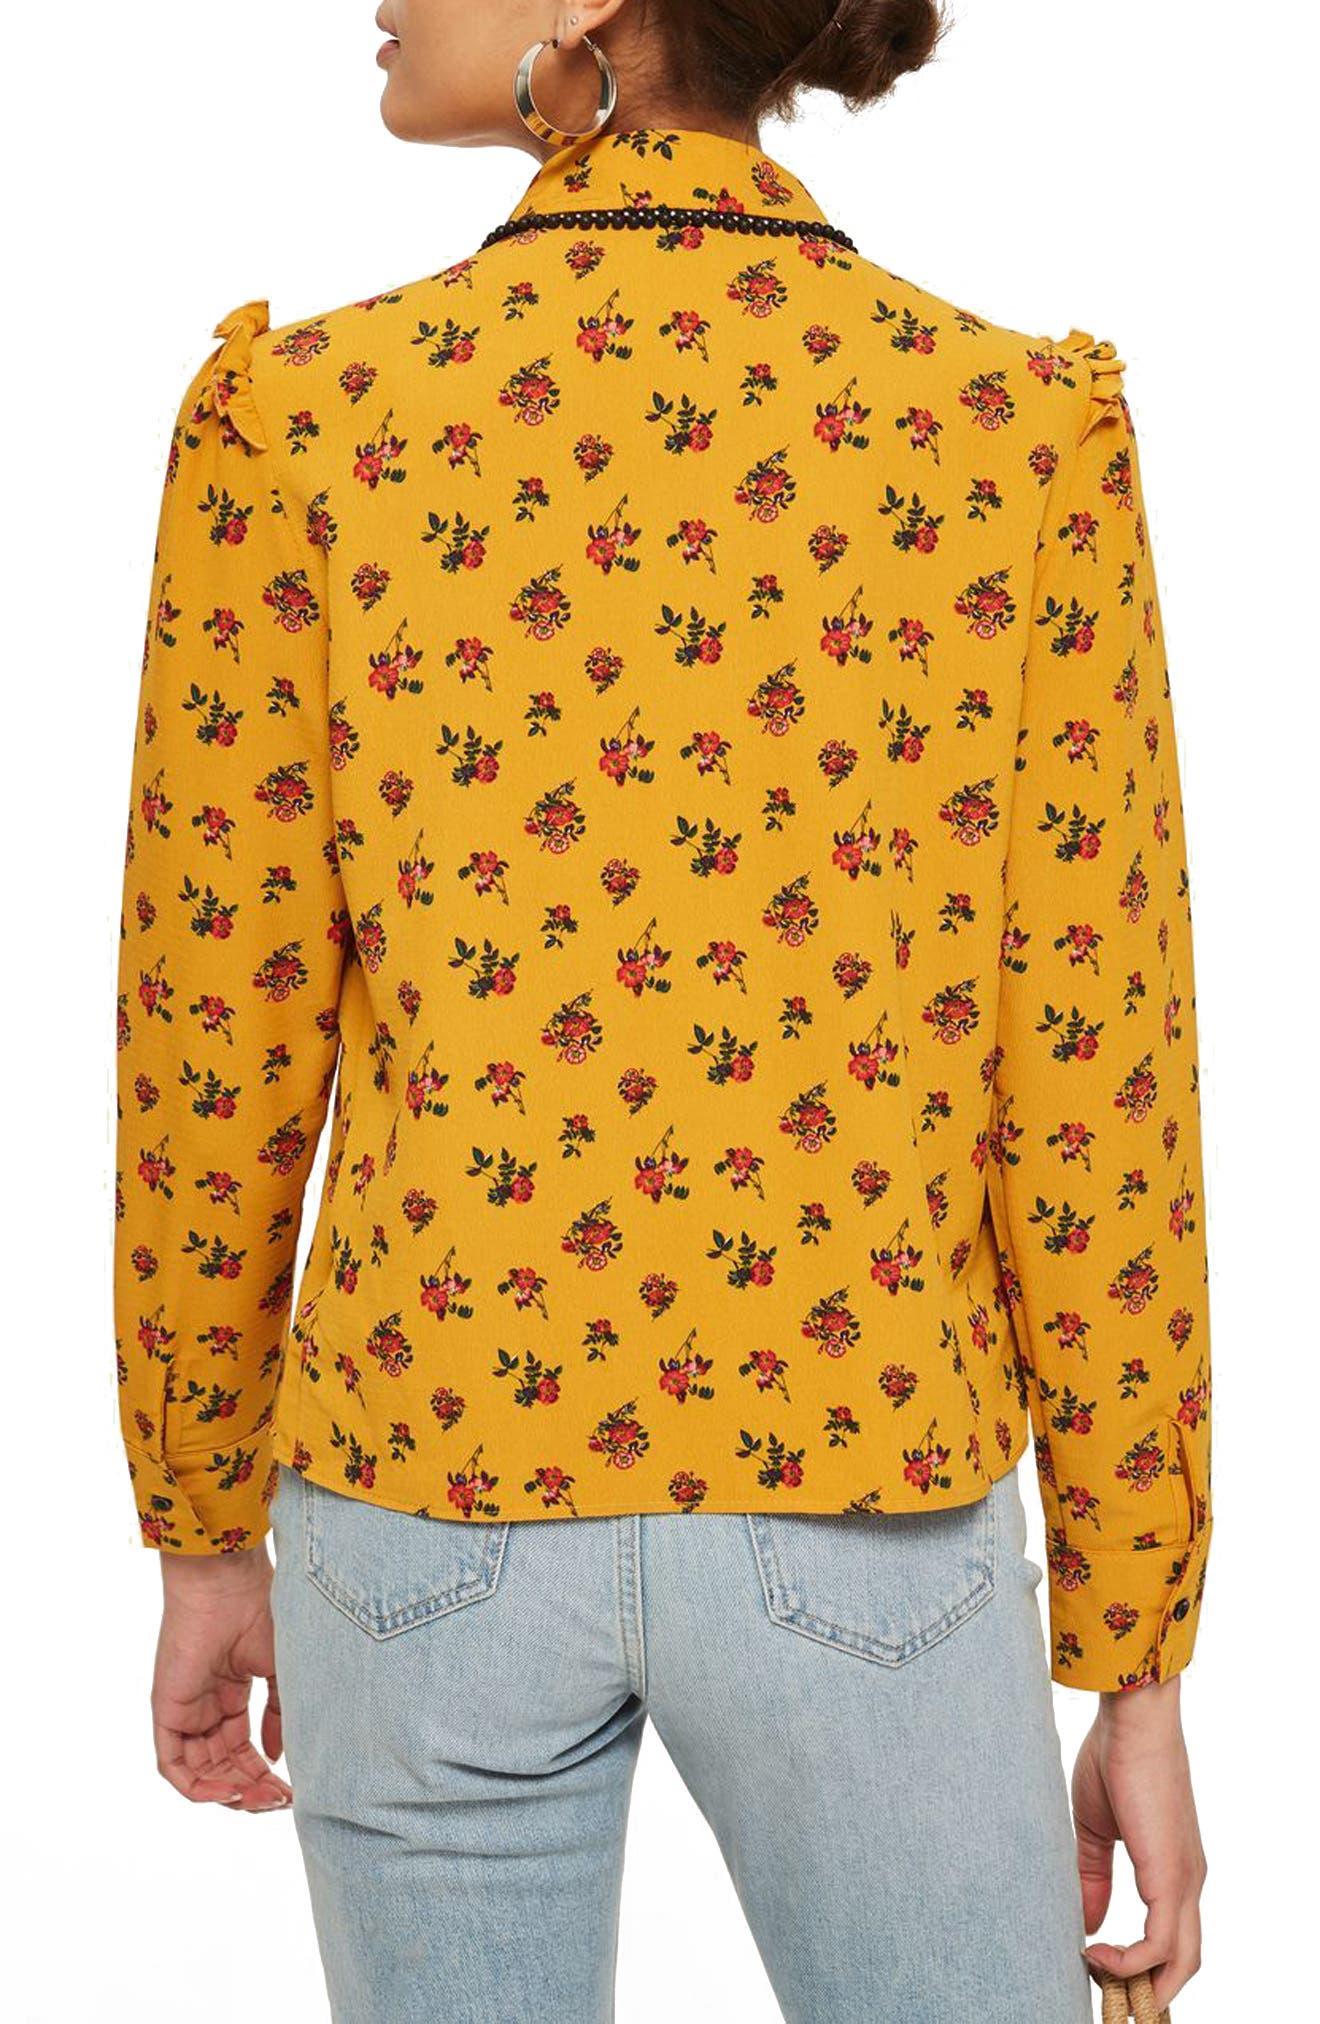 Rodeo Floral Retro Shirt,                             Alternate thumbnail 2, color,                             Mustard